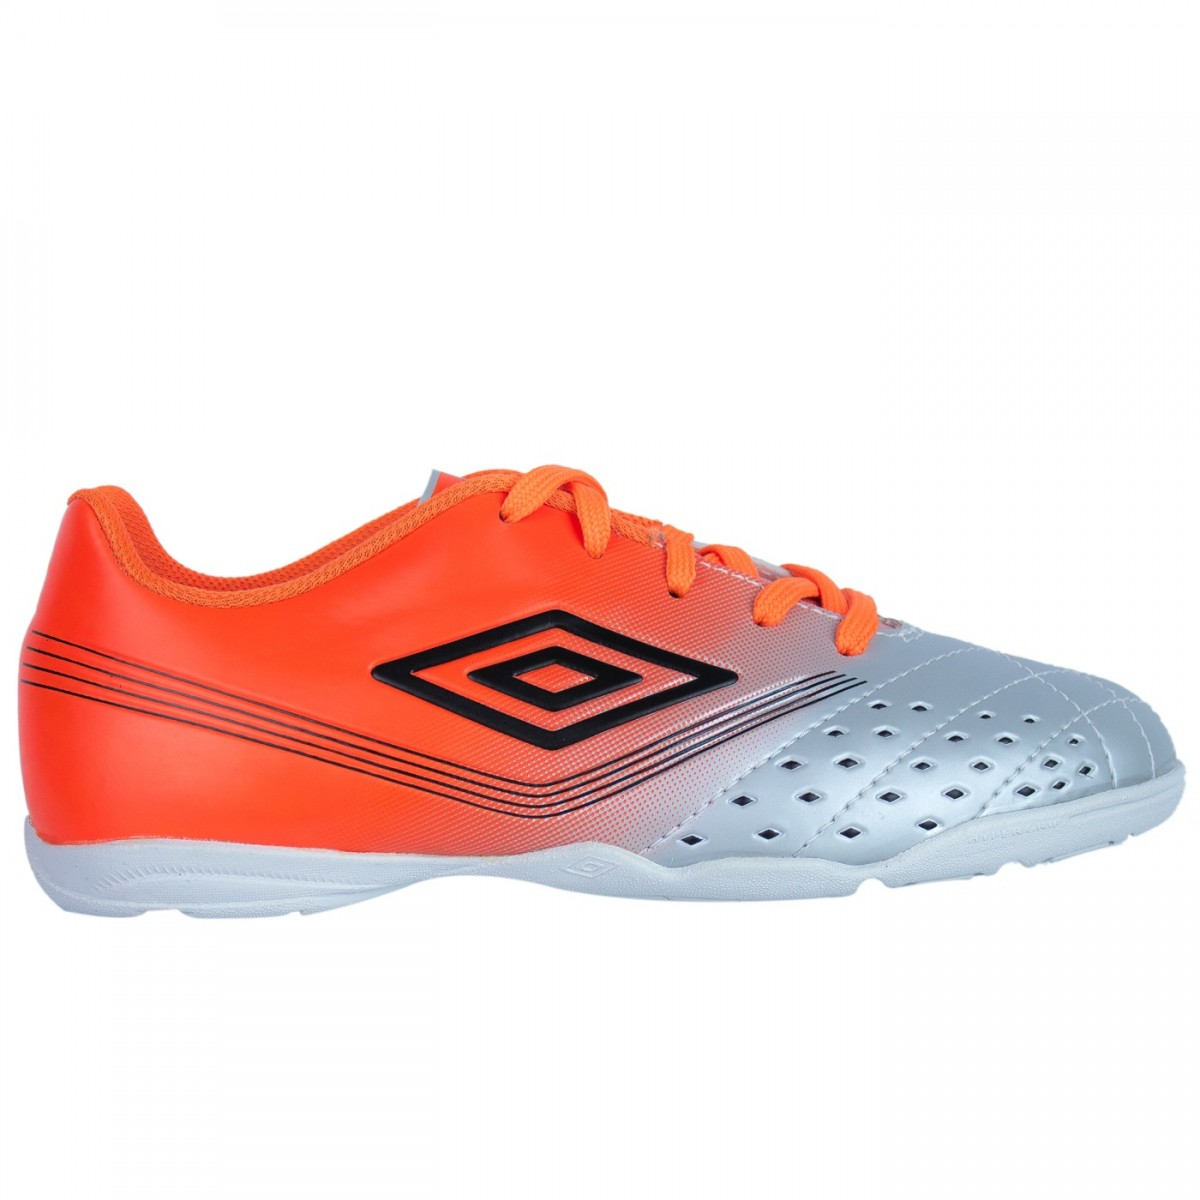 ce86bf4fcd Bizz Store - Chuteira Futsal Infantil Masculina Umbro Indoor